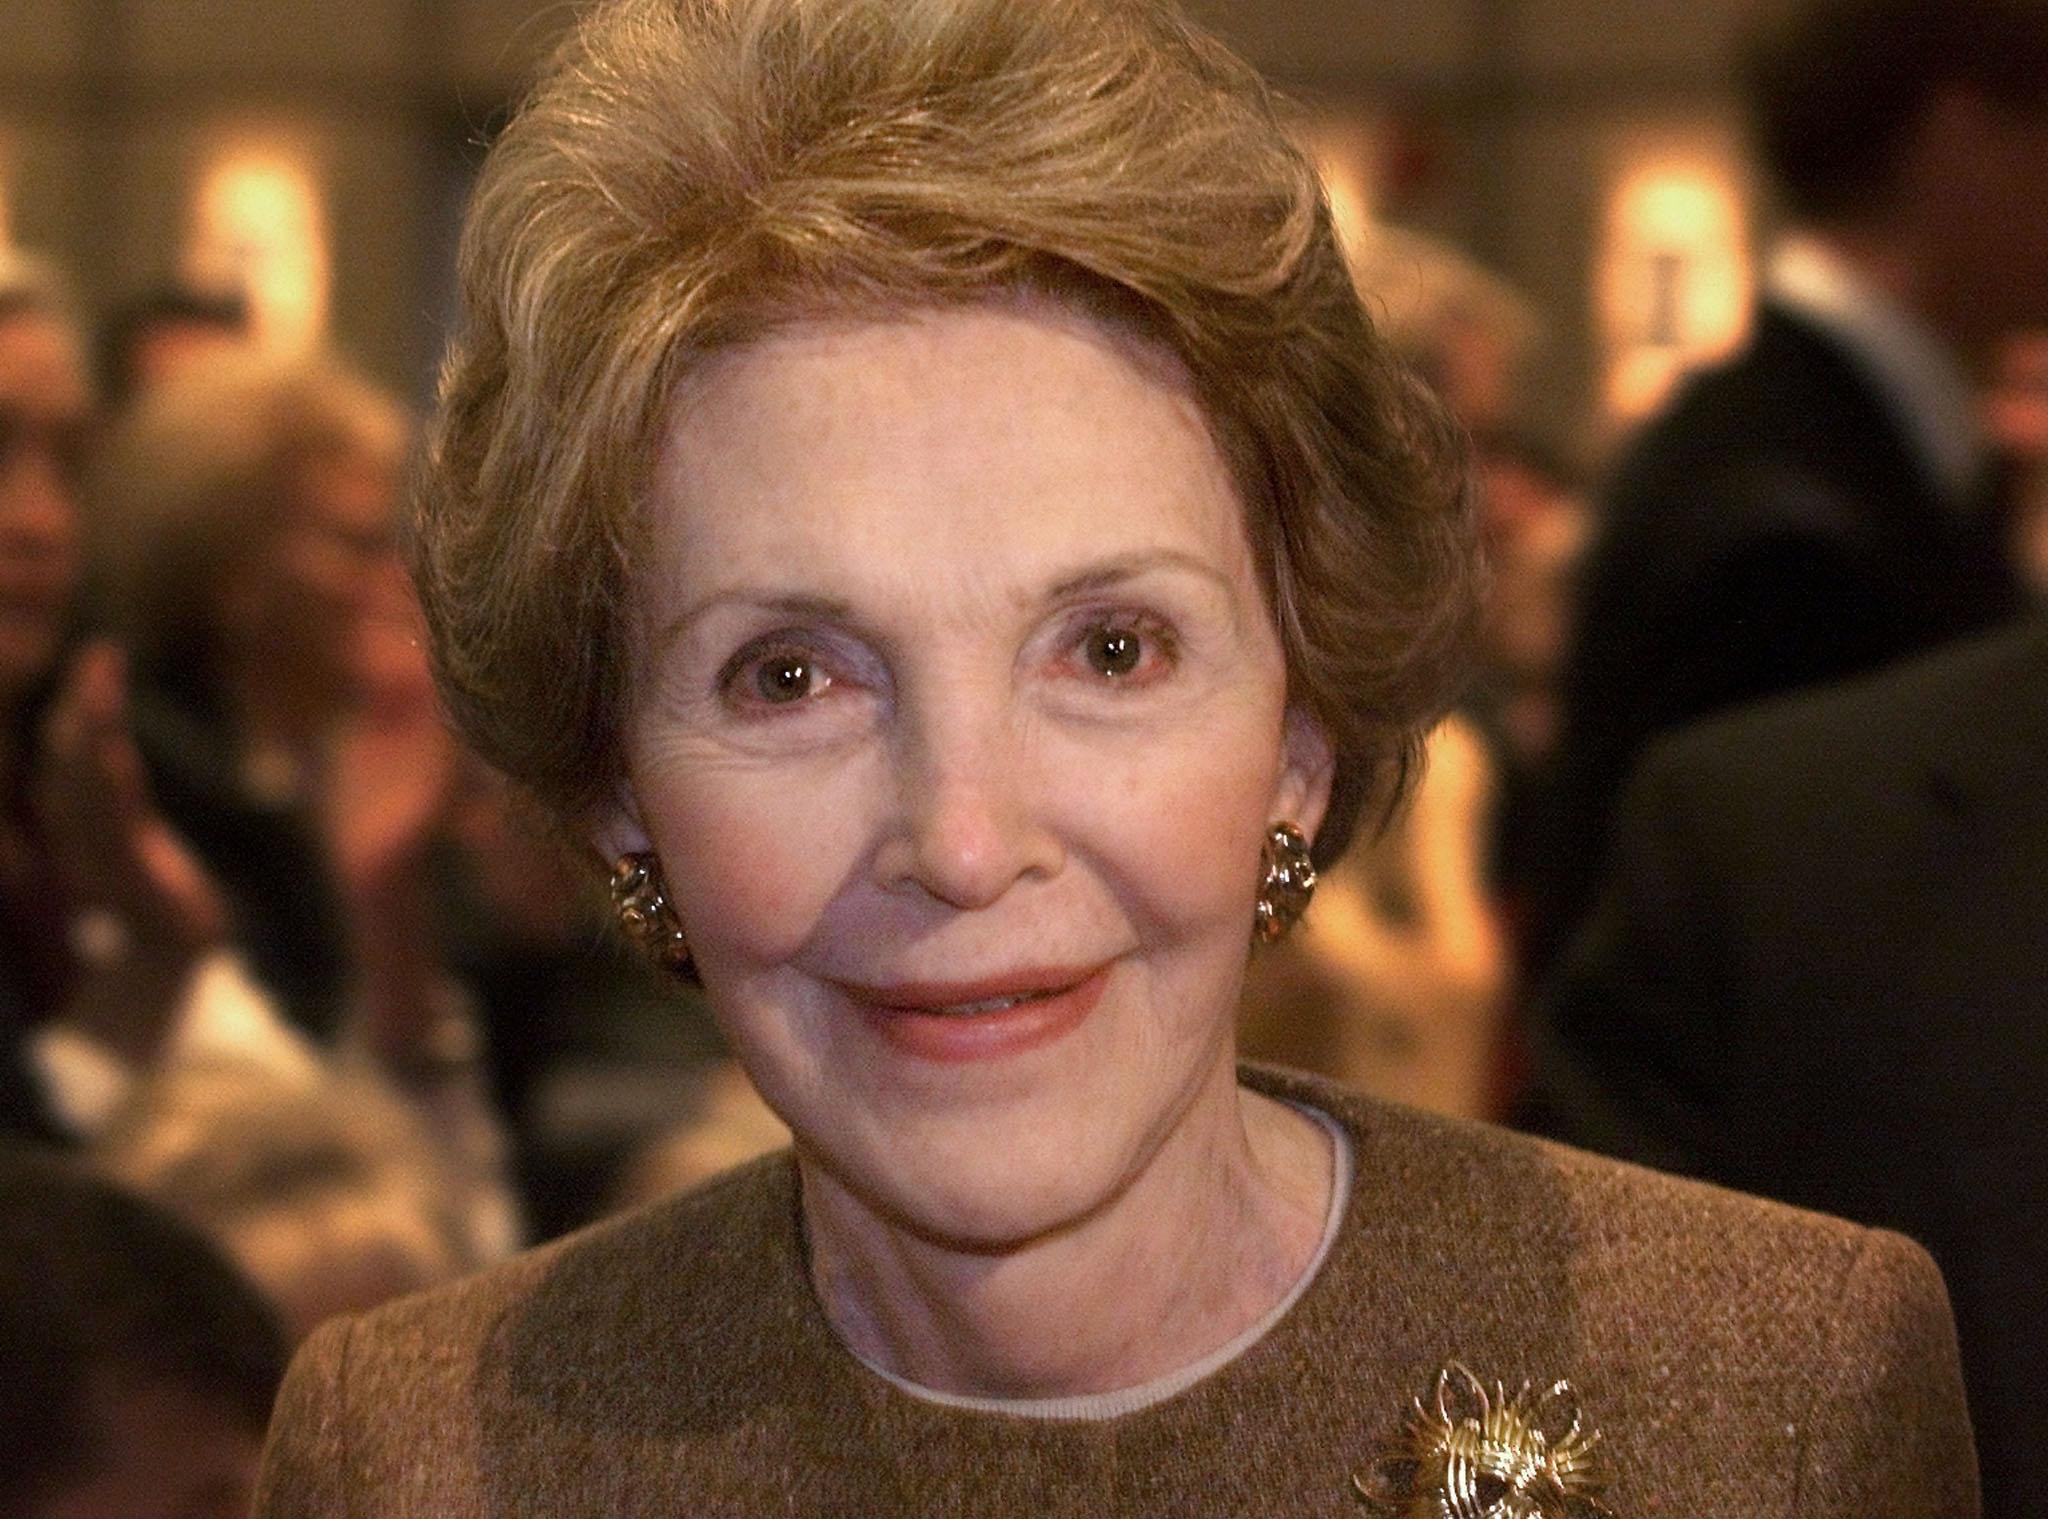 FORMER FIRST LADY NANCY REAGAN SMILES AT BUSH SPEECH.